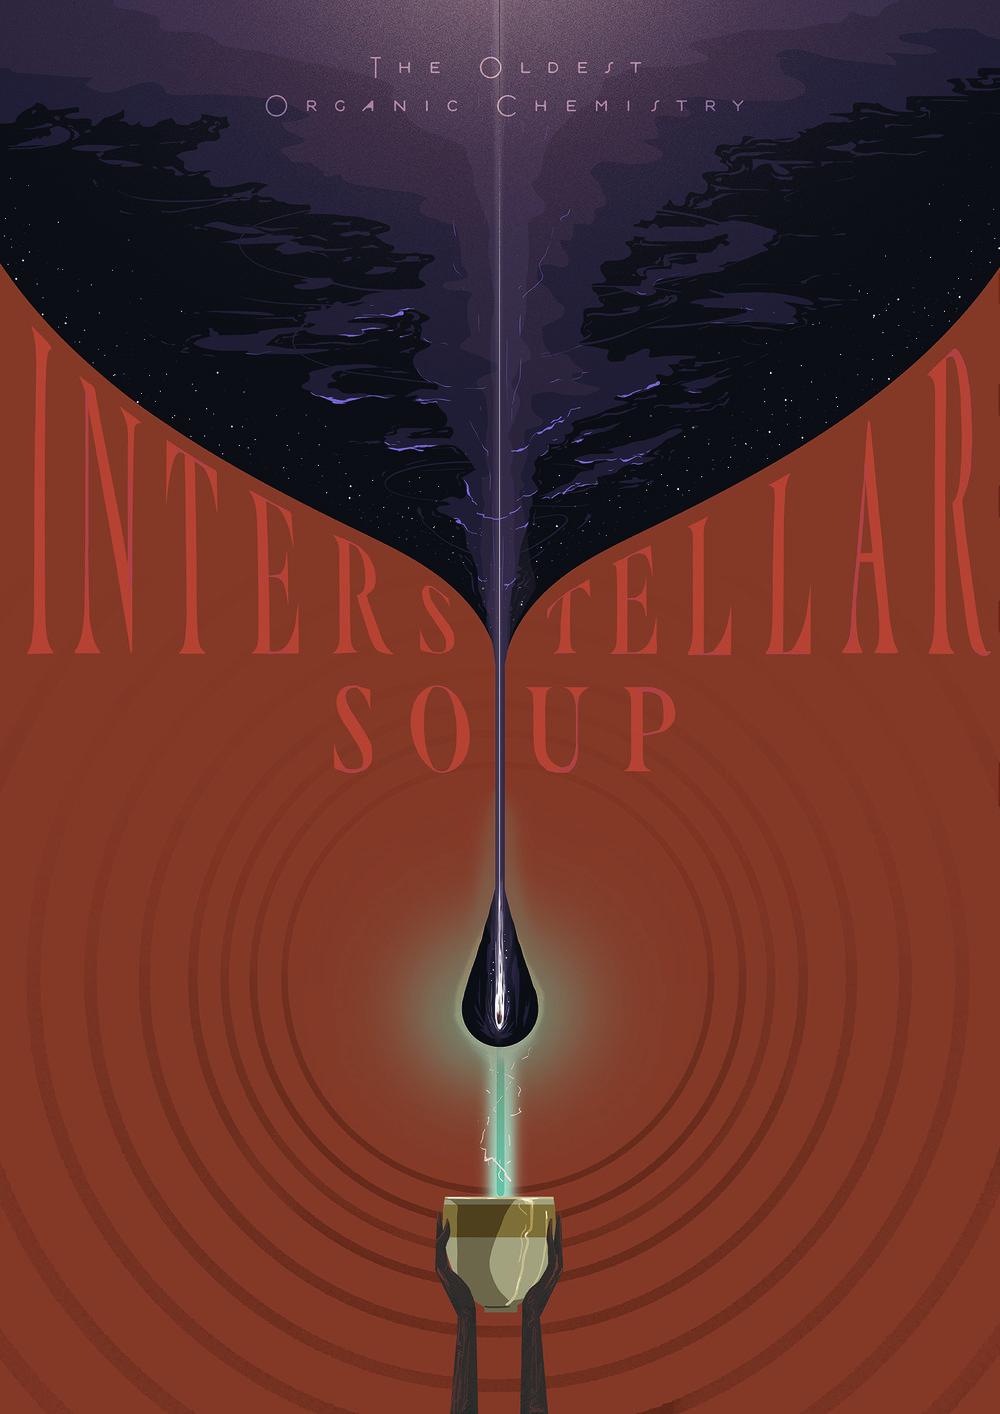 Interstellar Soup